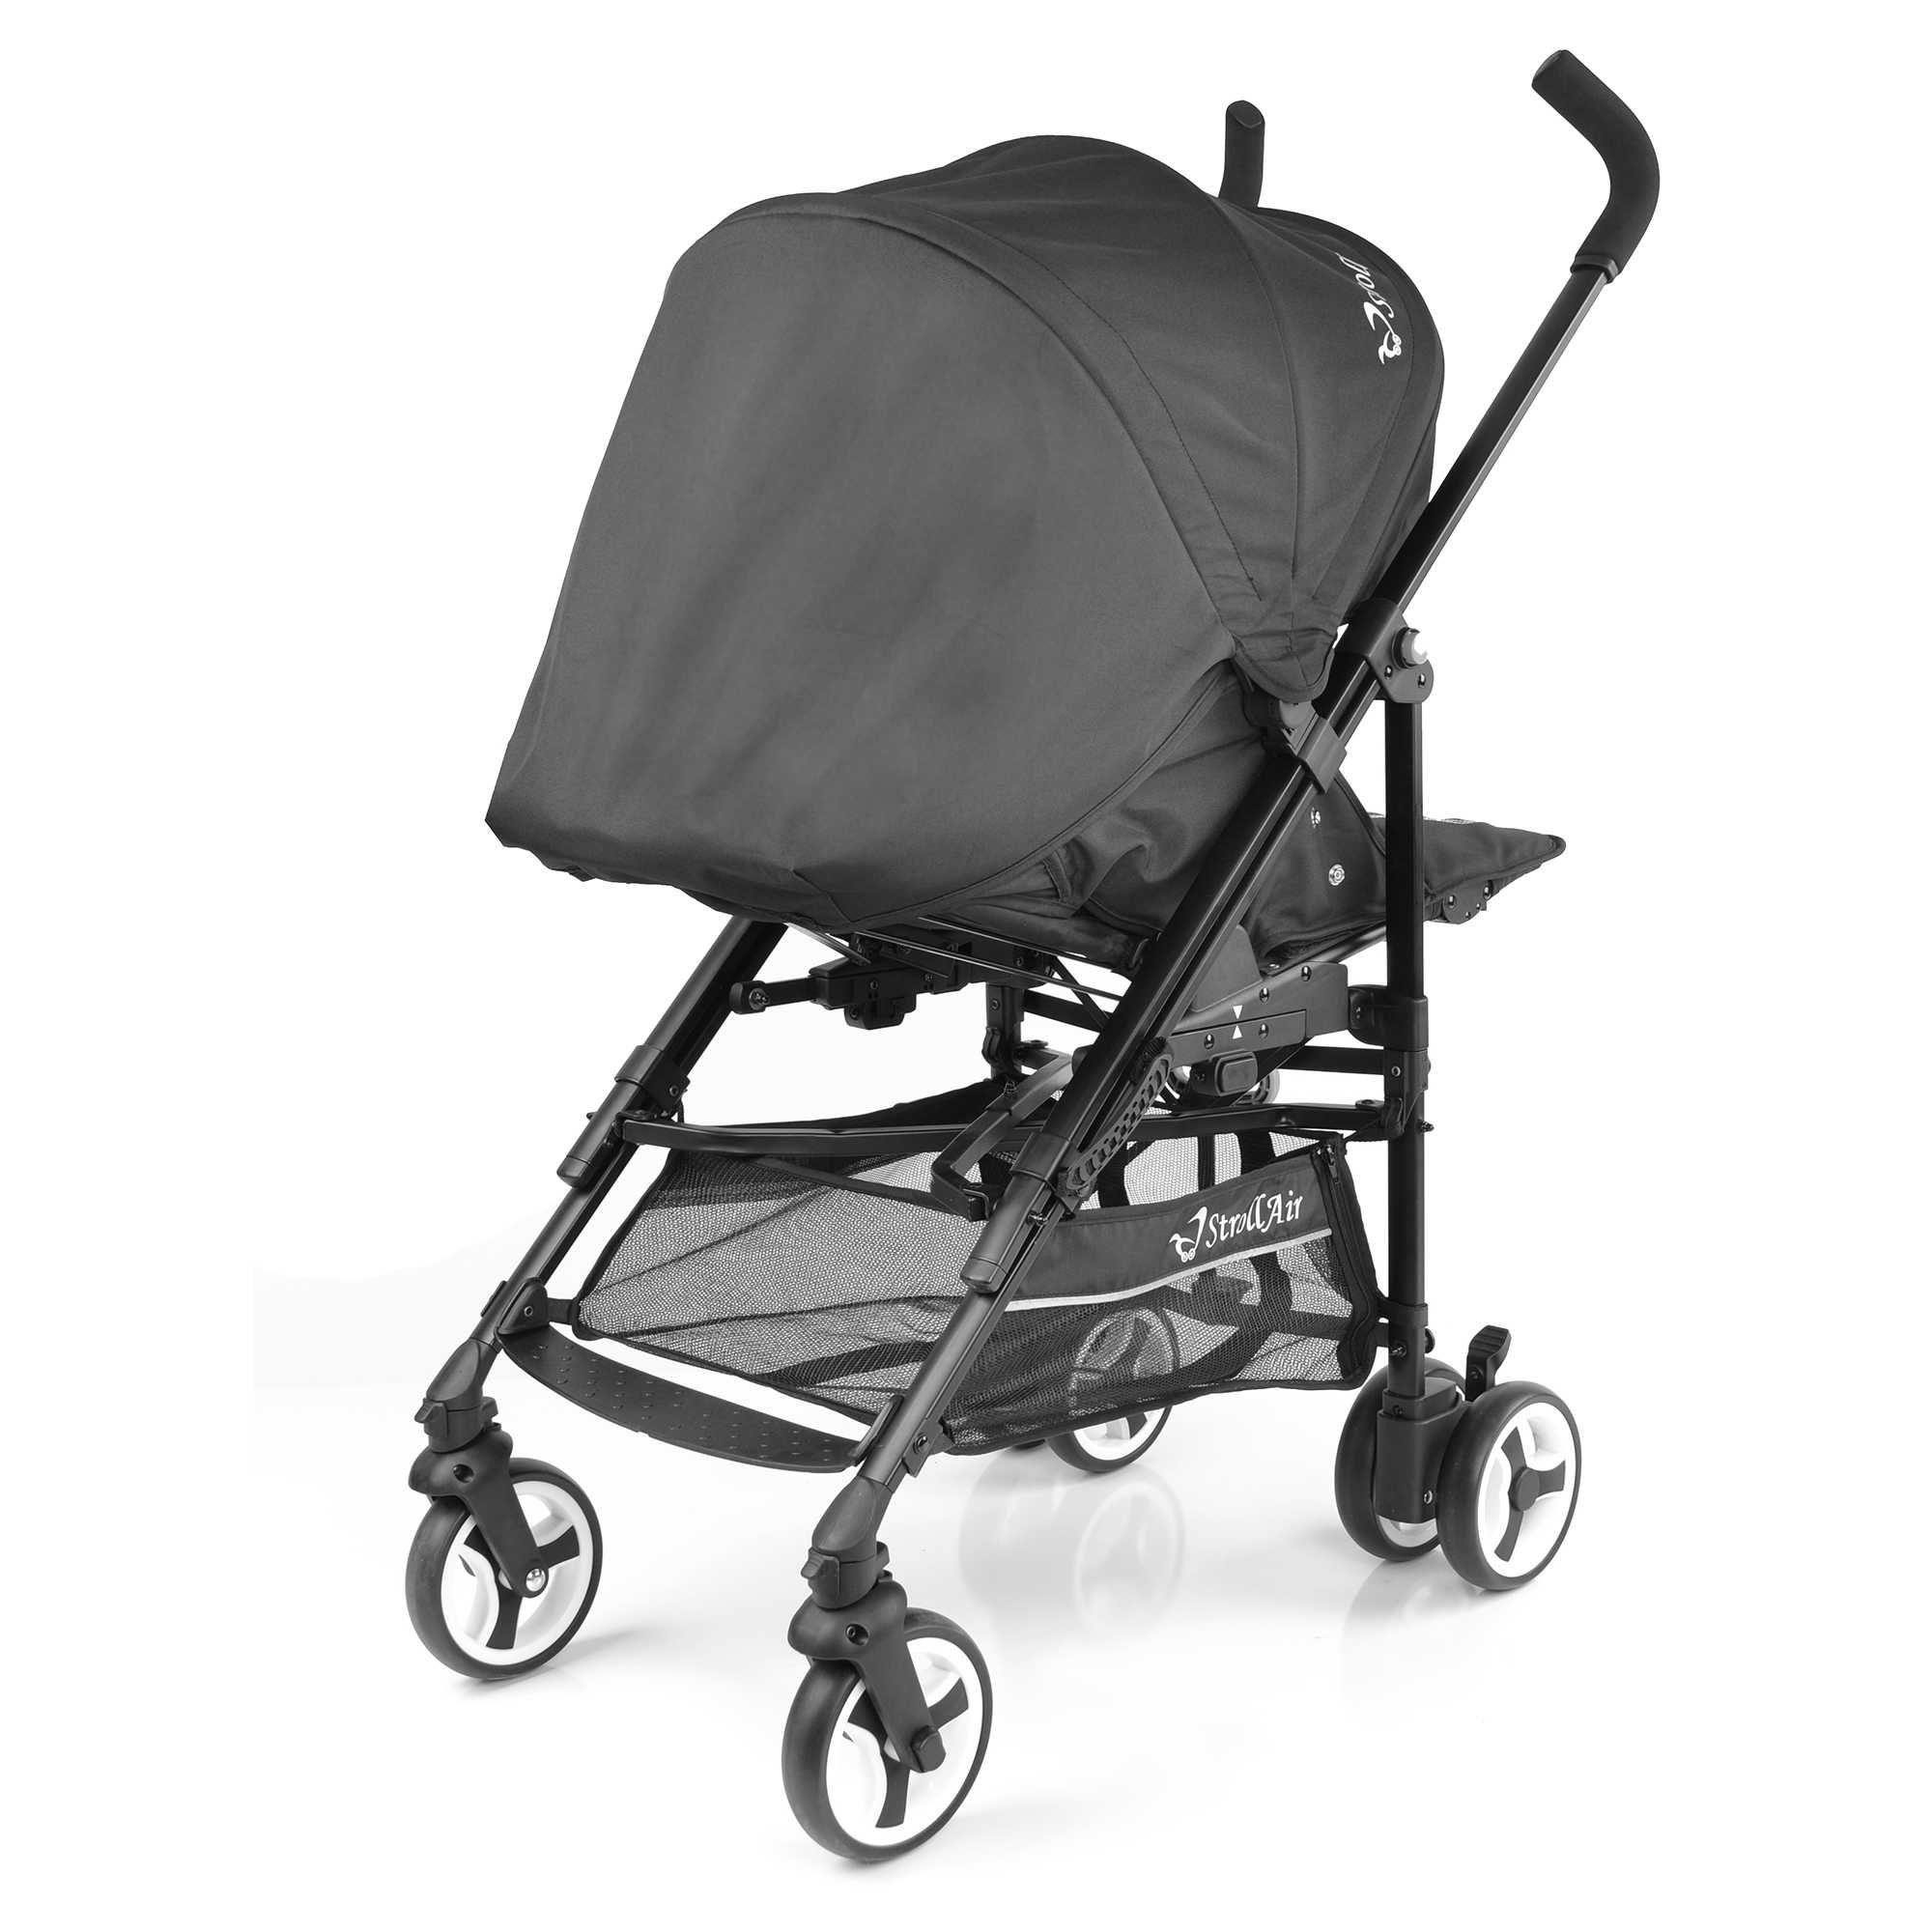 StrollAir ReVu Reversible Umbrella Stroller in Black